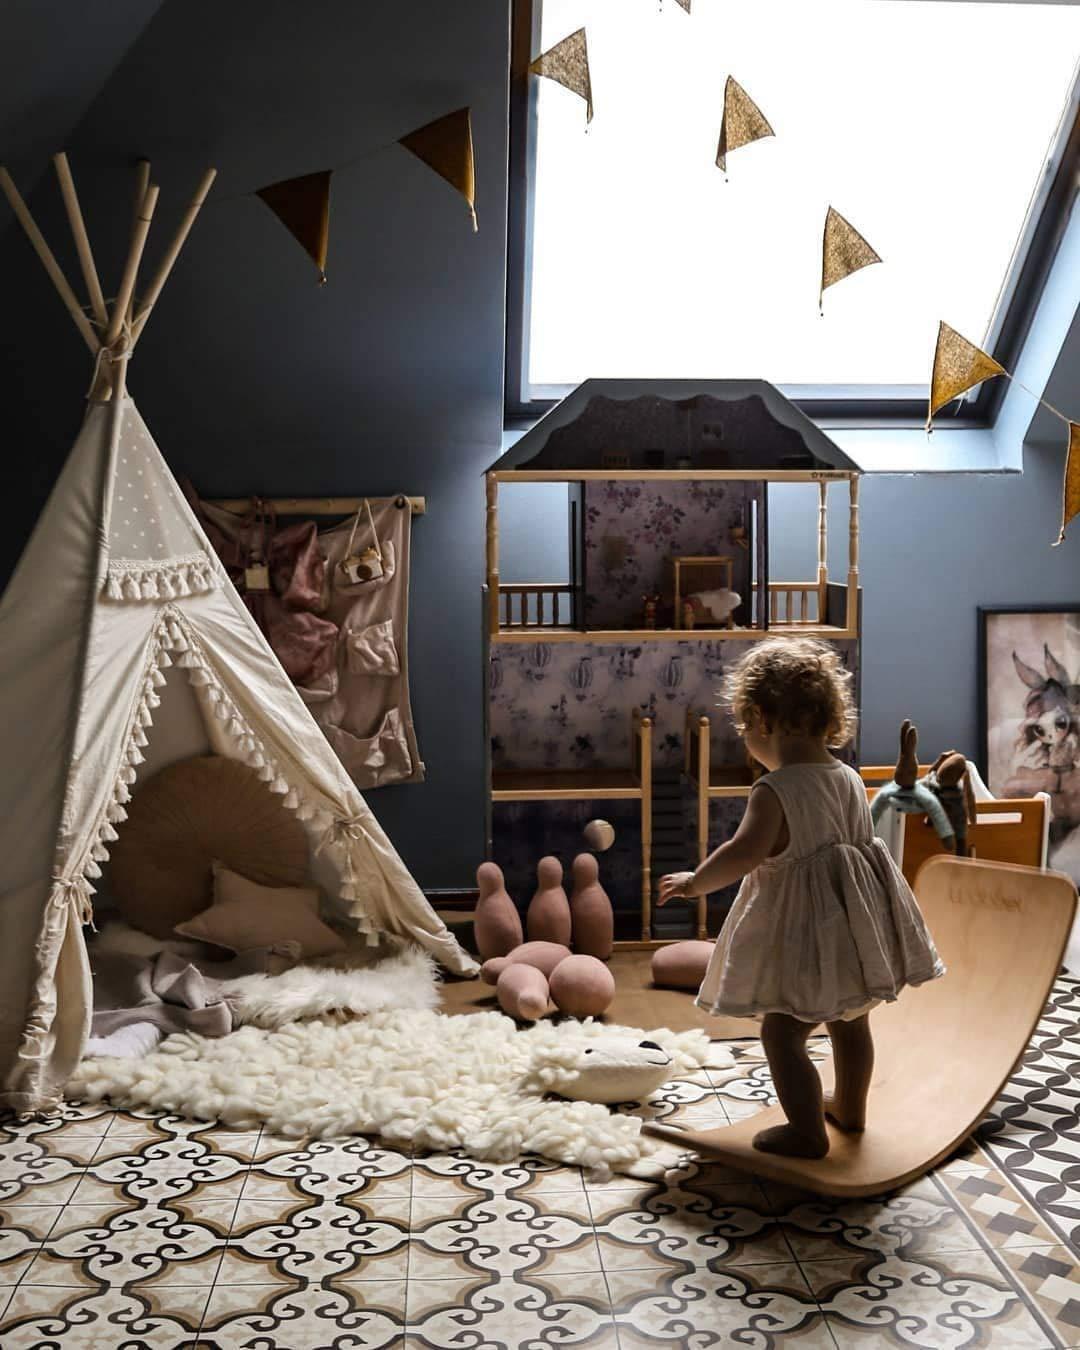 Boho style kids tipi, childrens teepee tent, kids teepee tent, play tent, teepee for kids, beige color playhouse 100% handmade! by MINICAMP (Image #8)